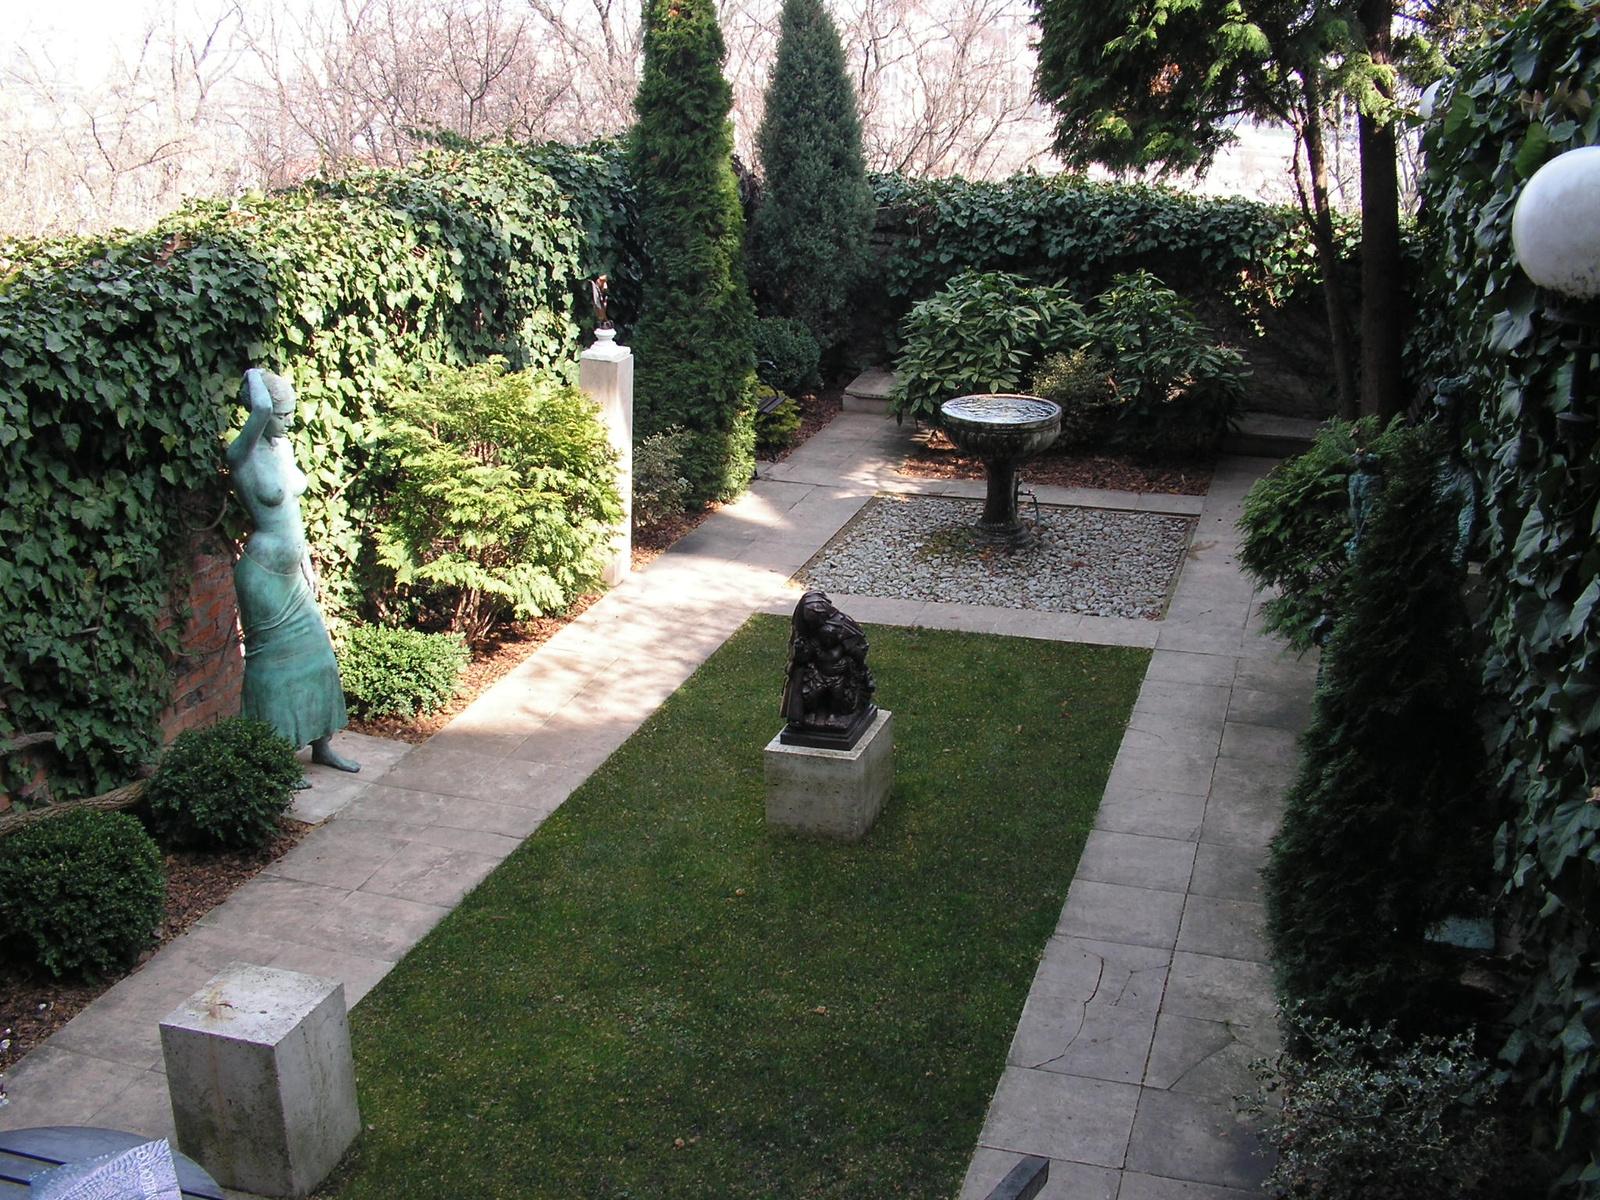 Budapest, a Budai várnegyed, a Koller Galéria kertje, SzG3